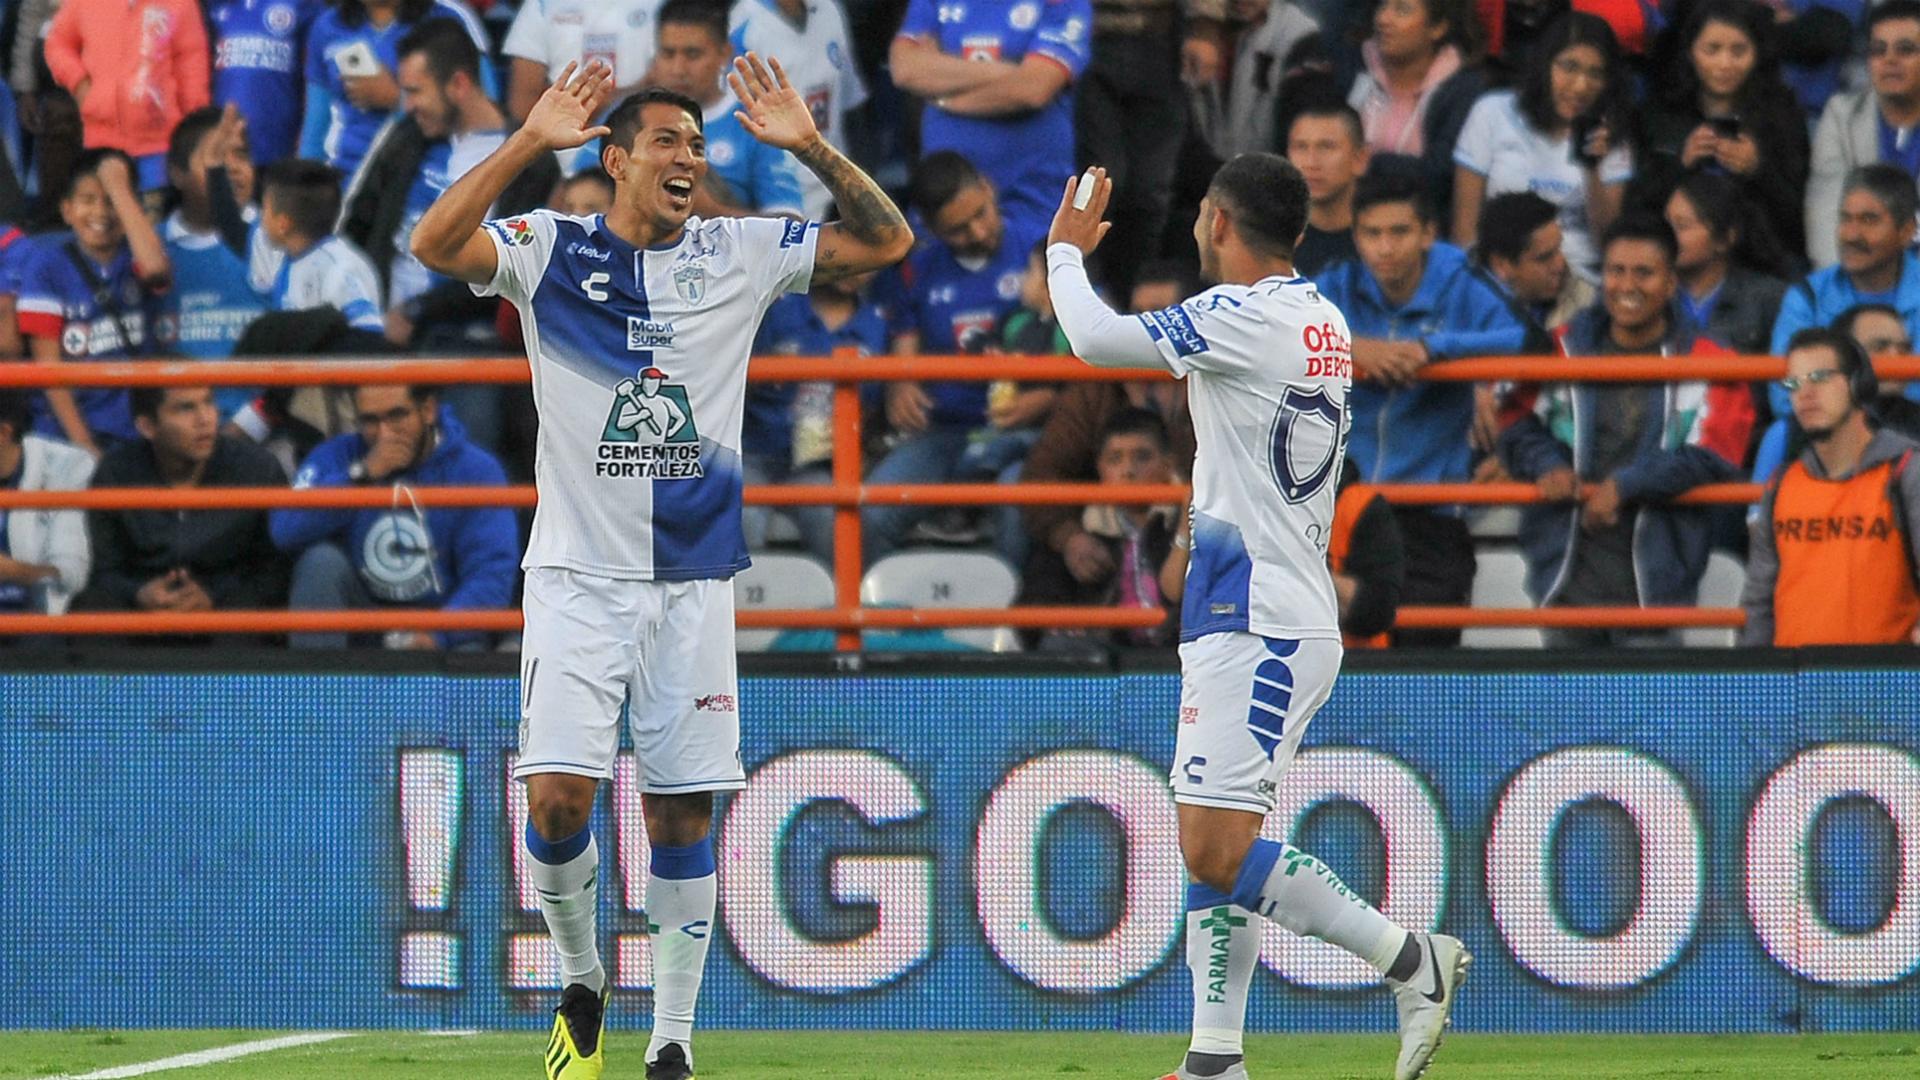 Pedro Caixinha, fuera tres juegos de Copa MX